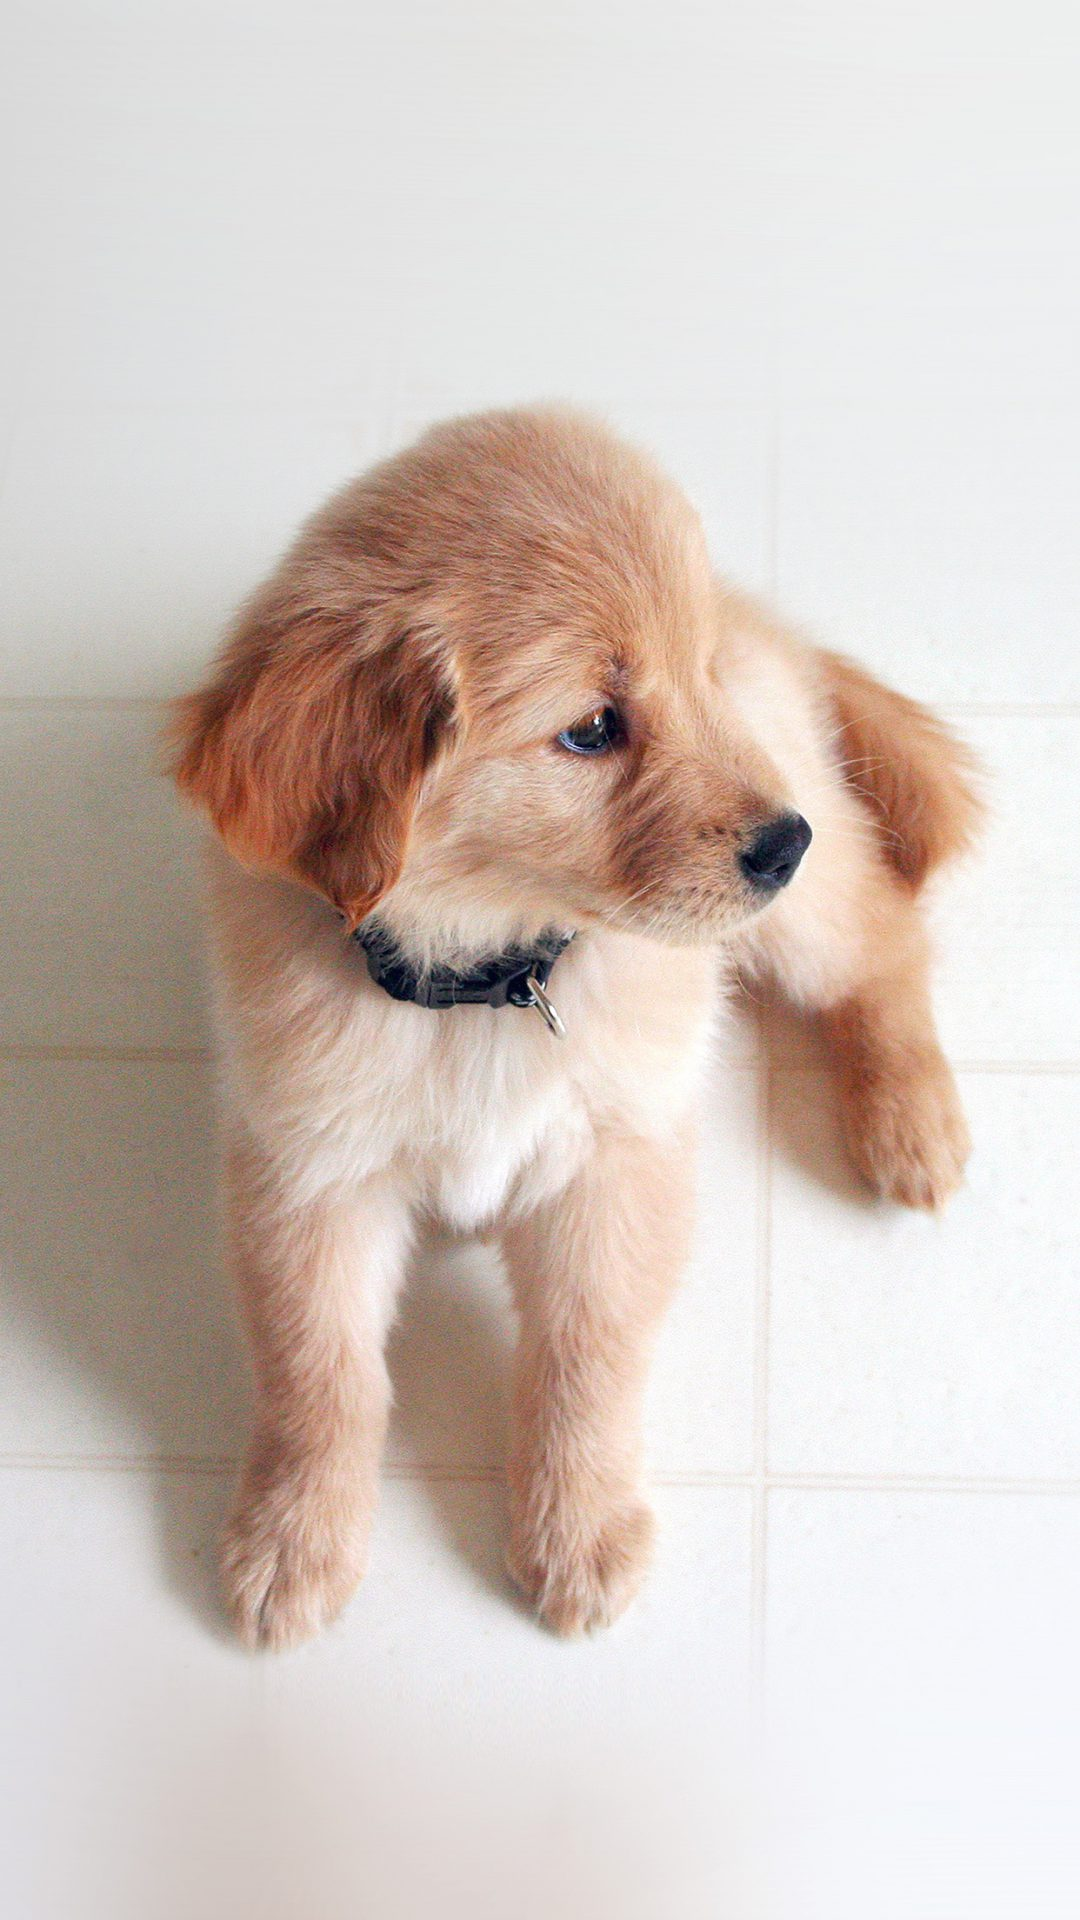 Puppy Love Cute Animal Nature Sitting Do